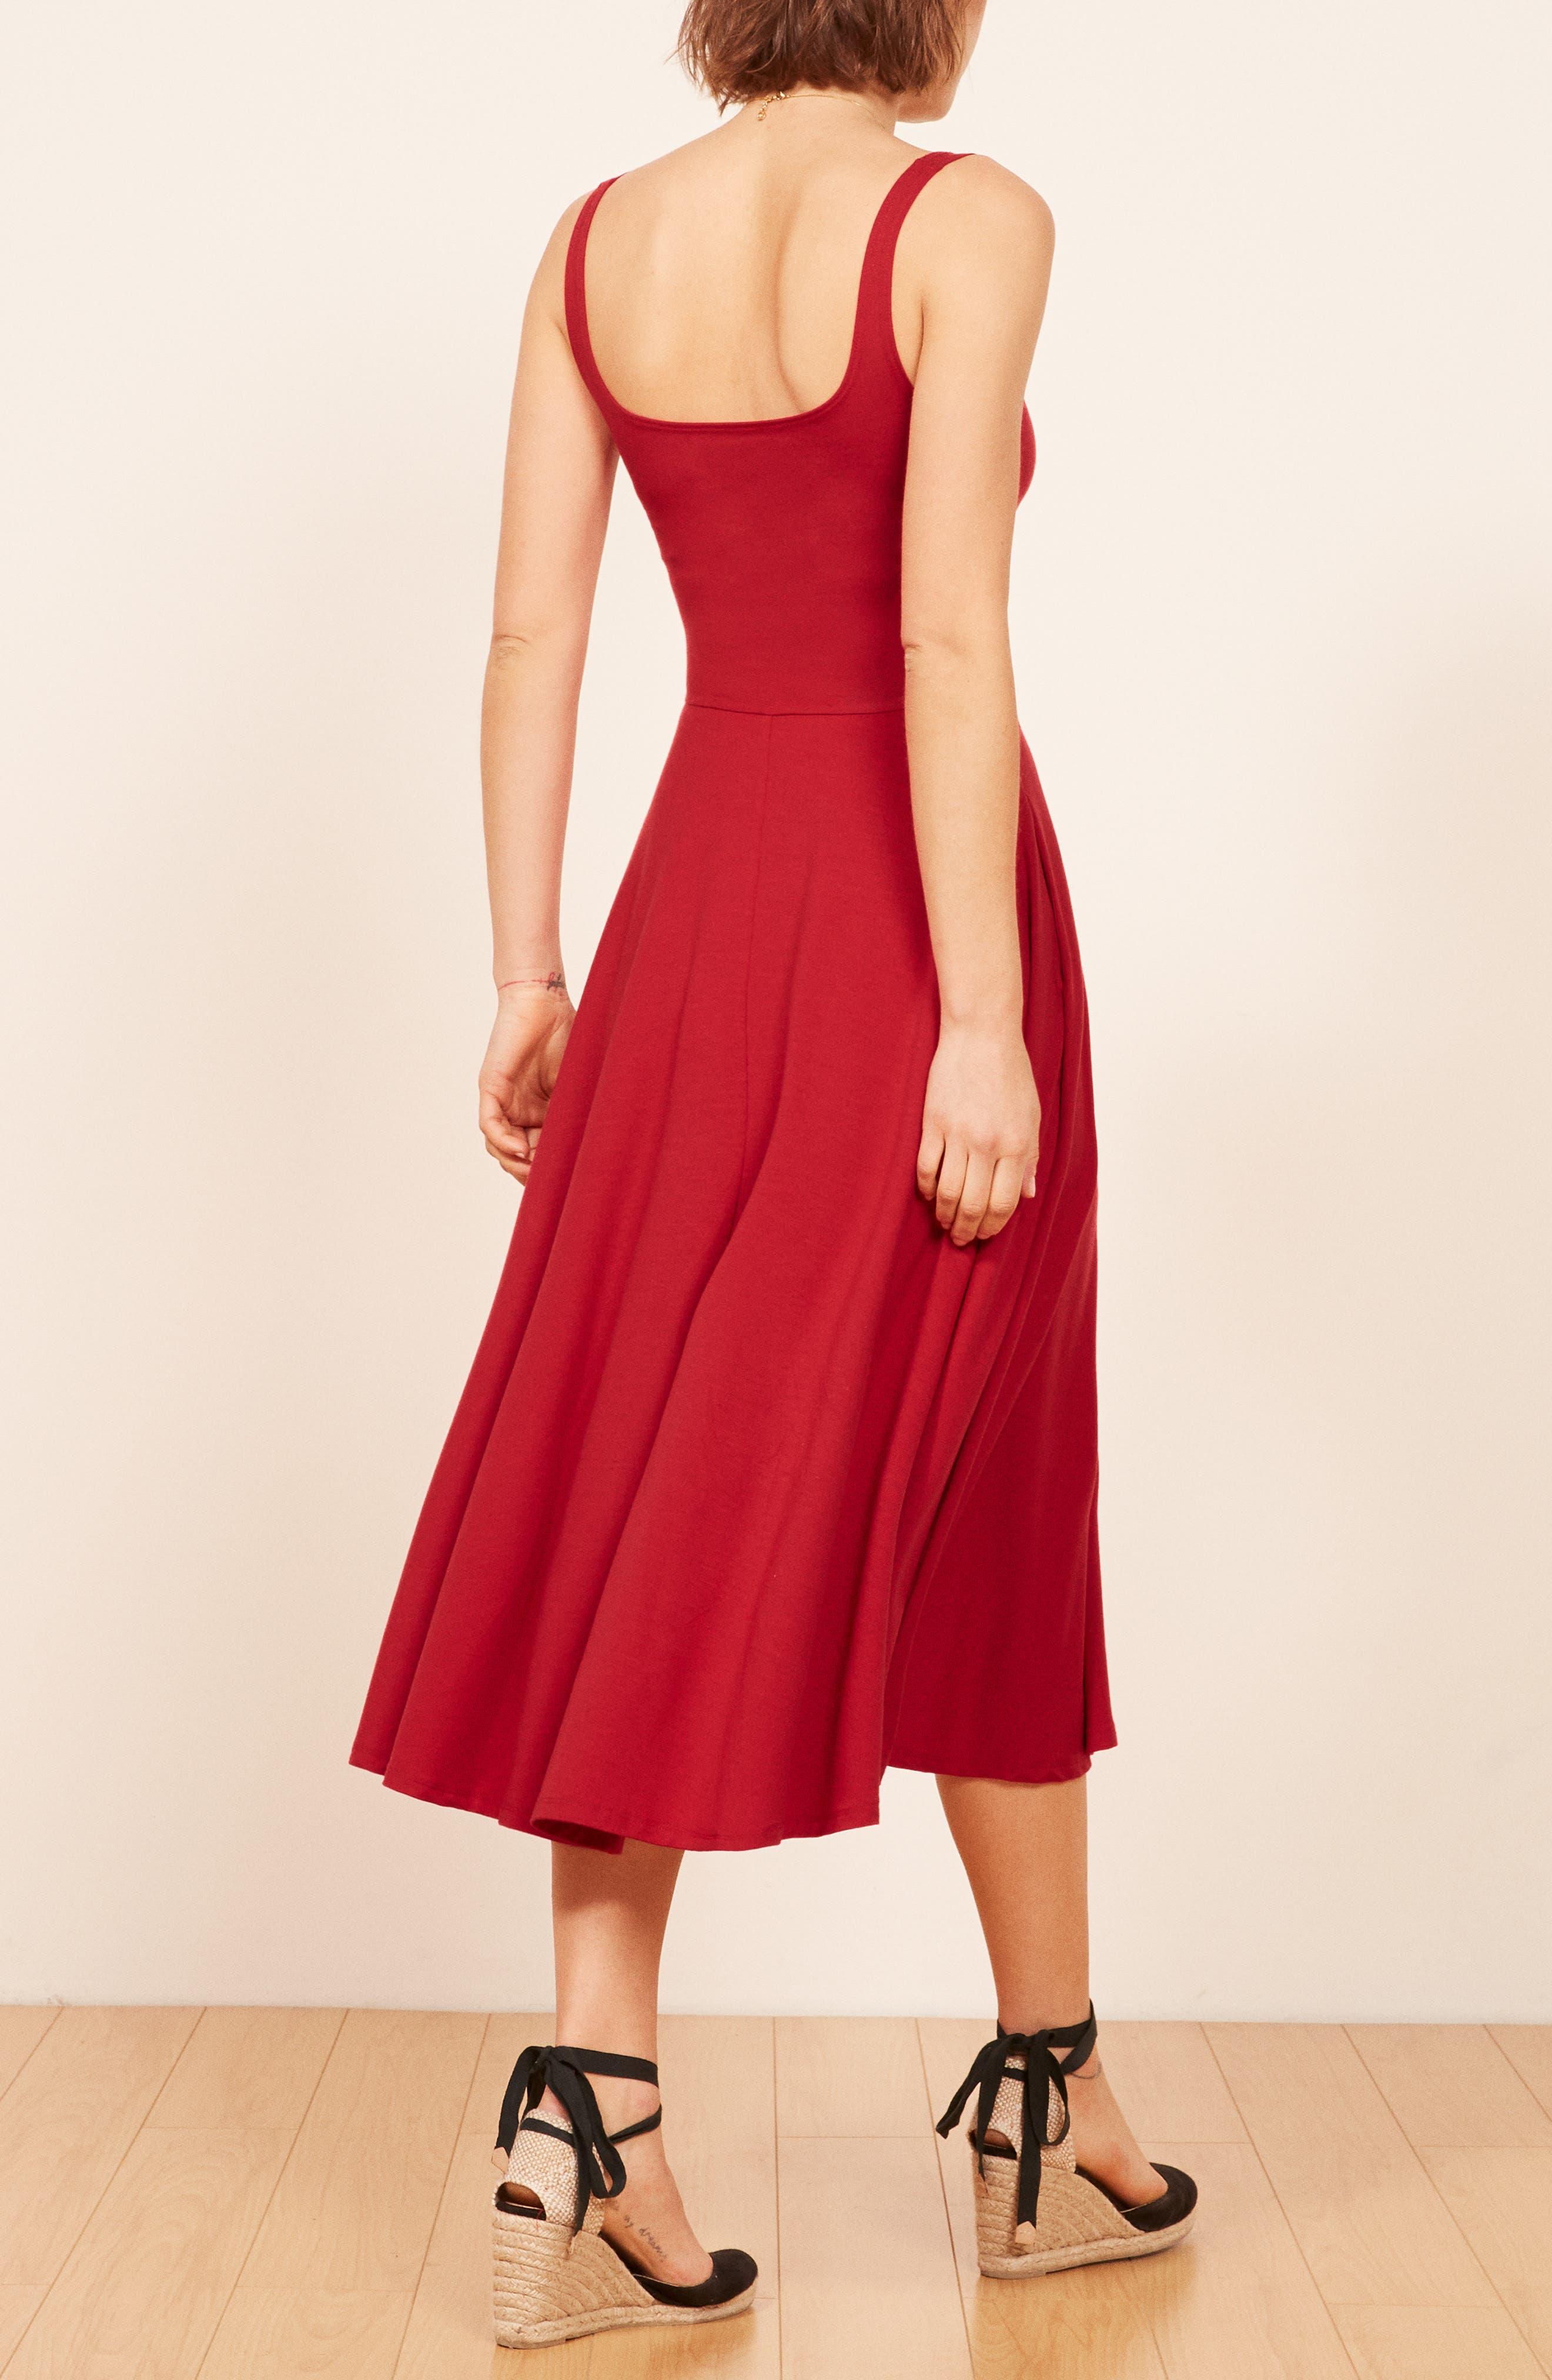 REFORMATION, Rou Midi Fit & Flare Dress, Alternate thumbnail 2, color, CHERRY